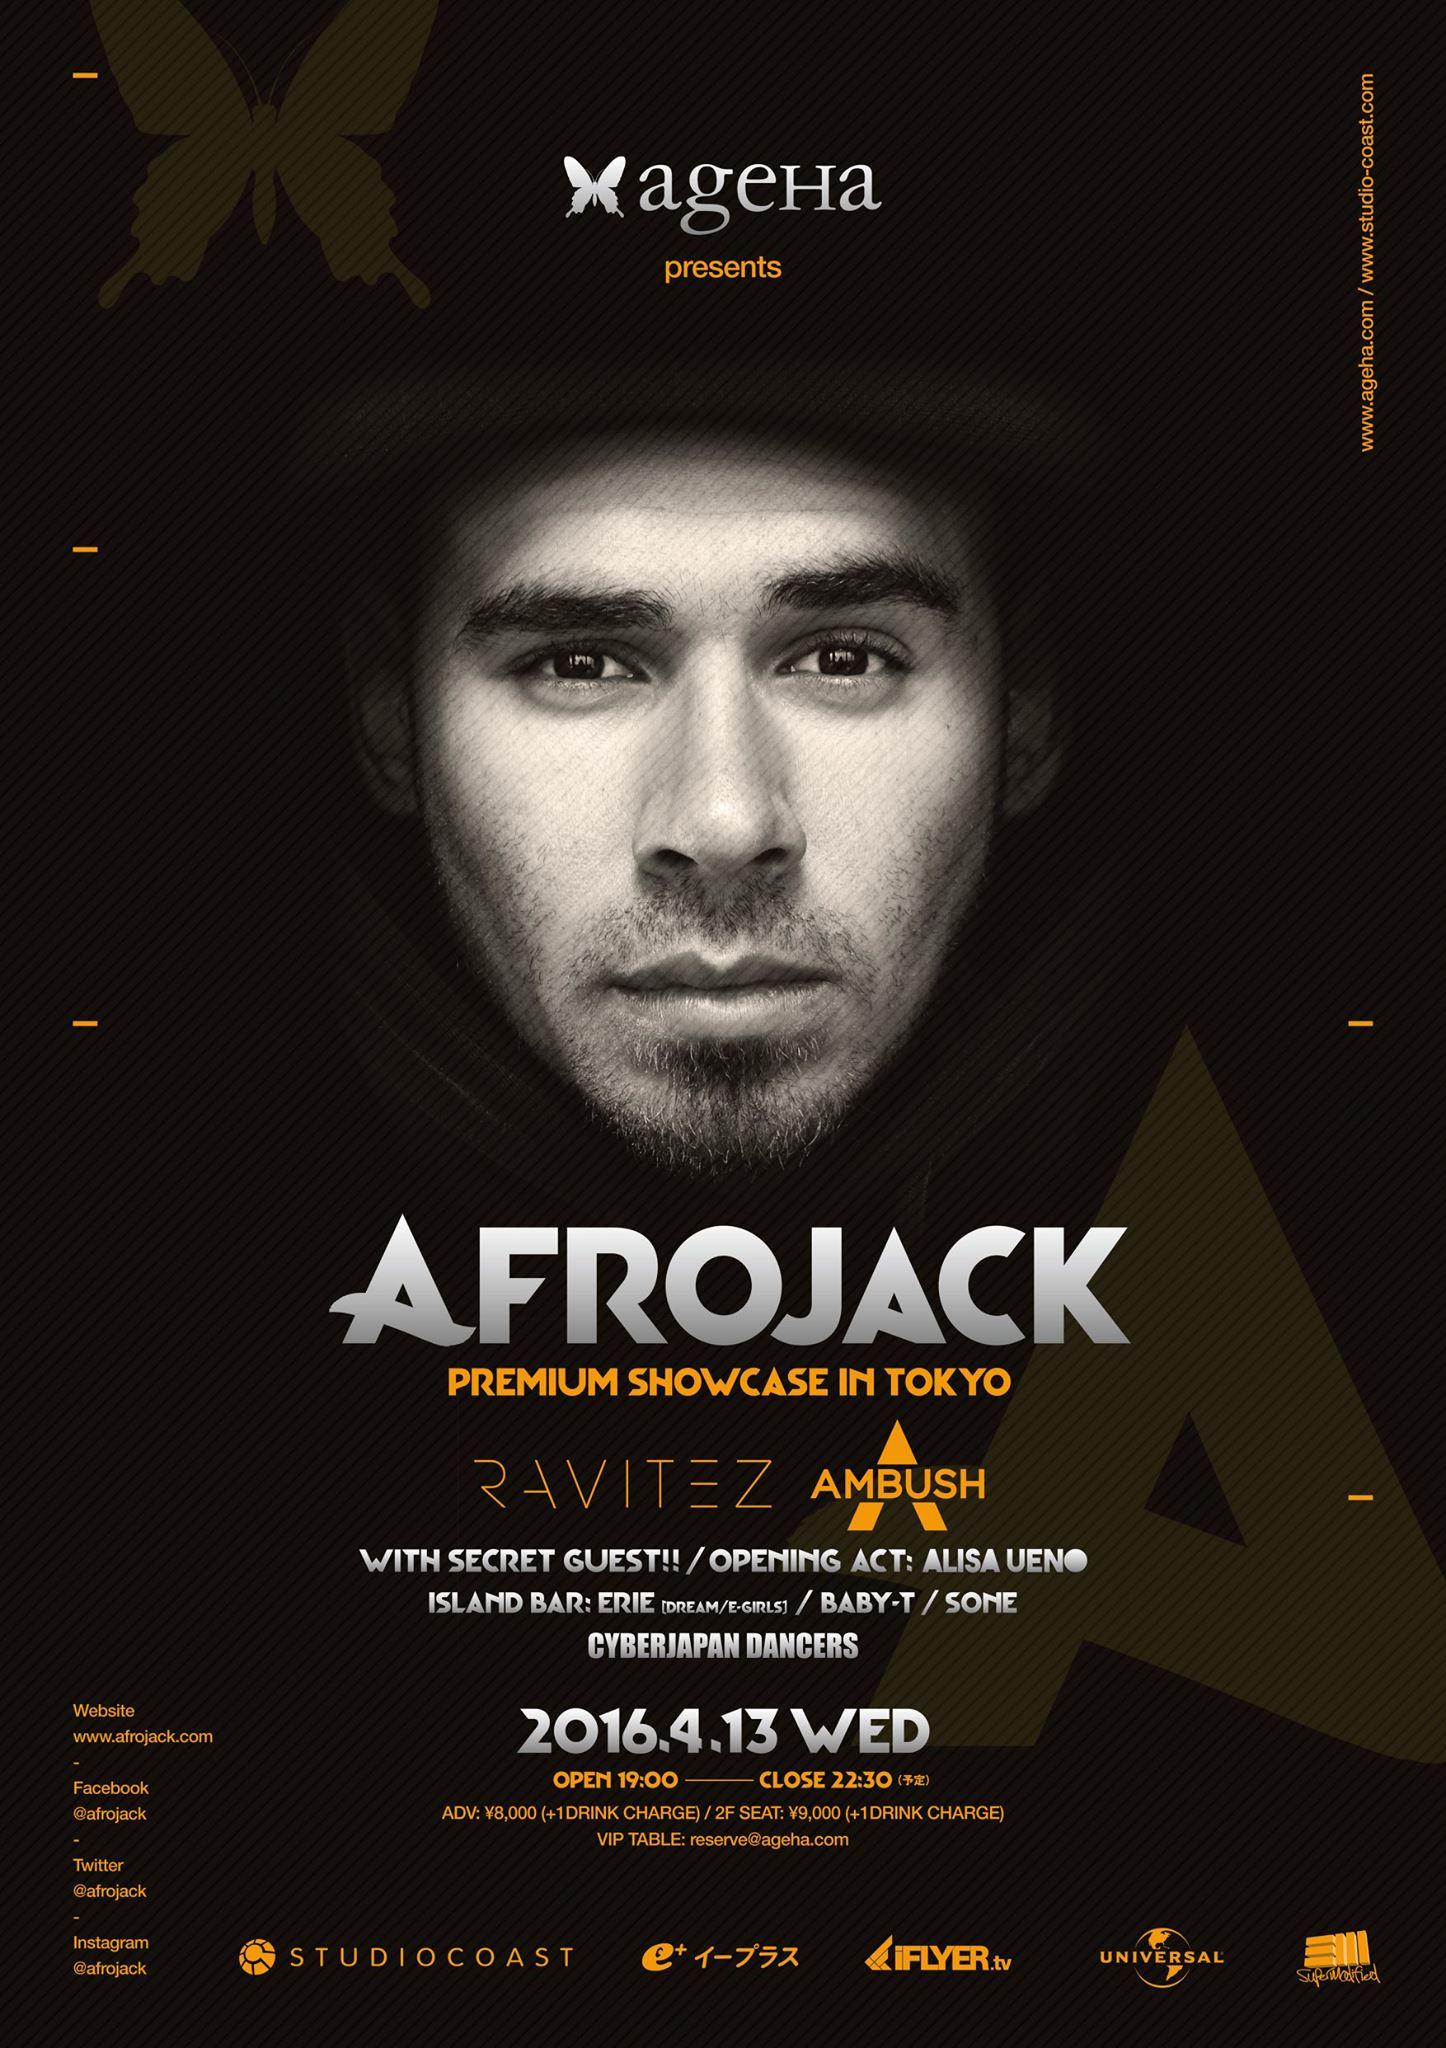 Afrojack ageHa 2016-04-13